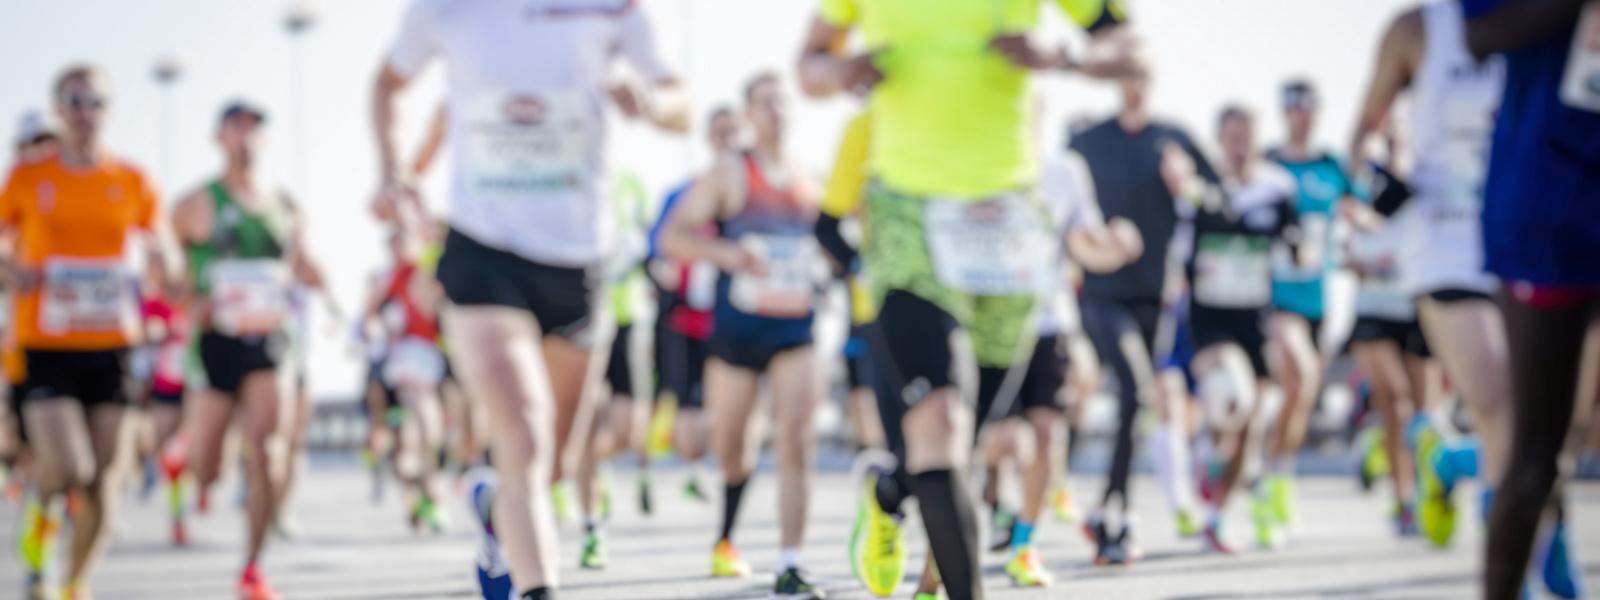 Namur International Marathon & Halb Marathon | Halb Marathon von Namur